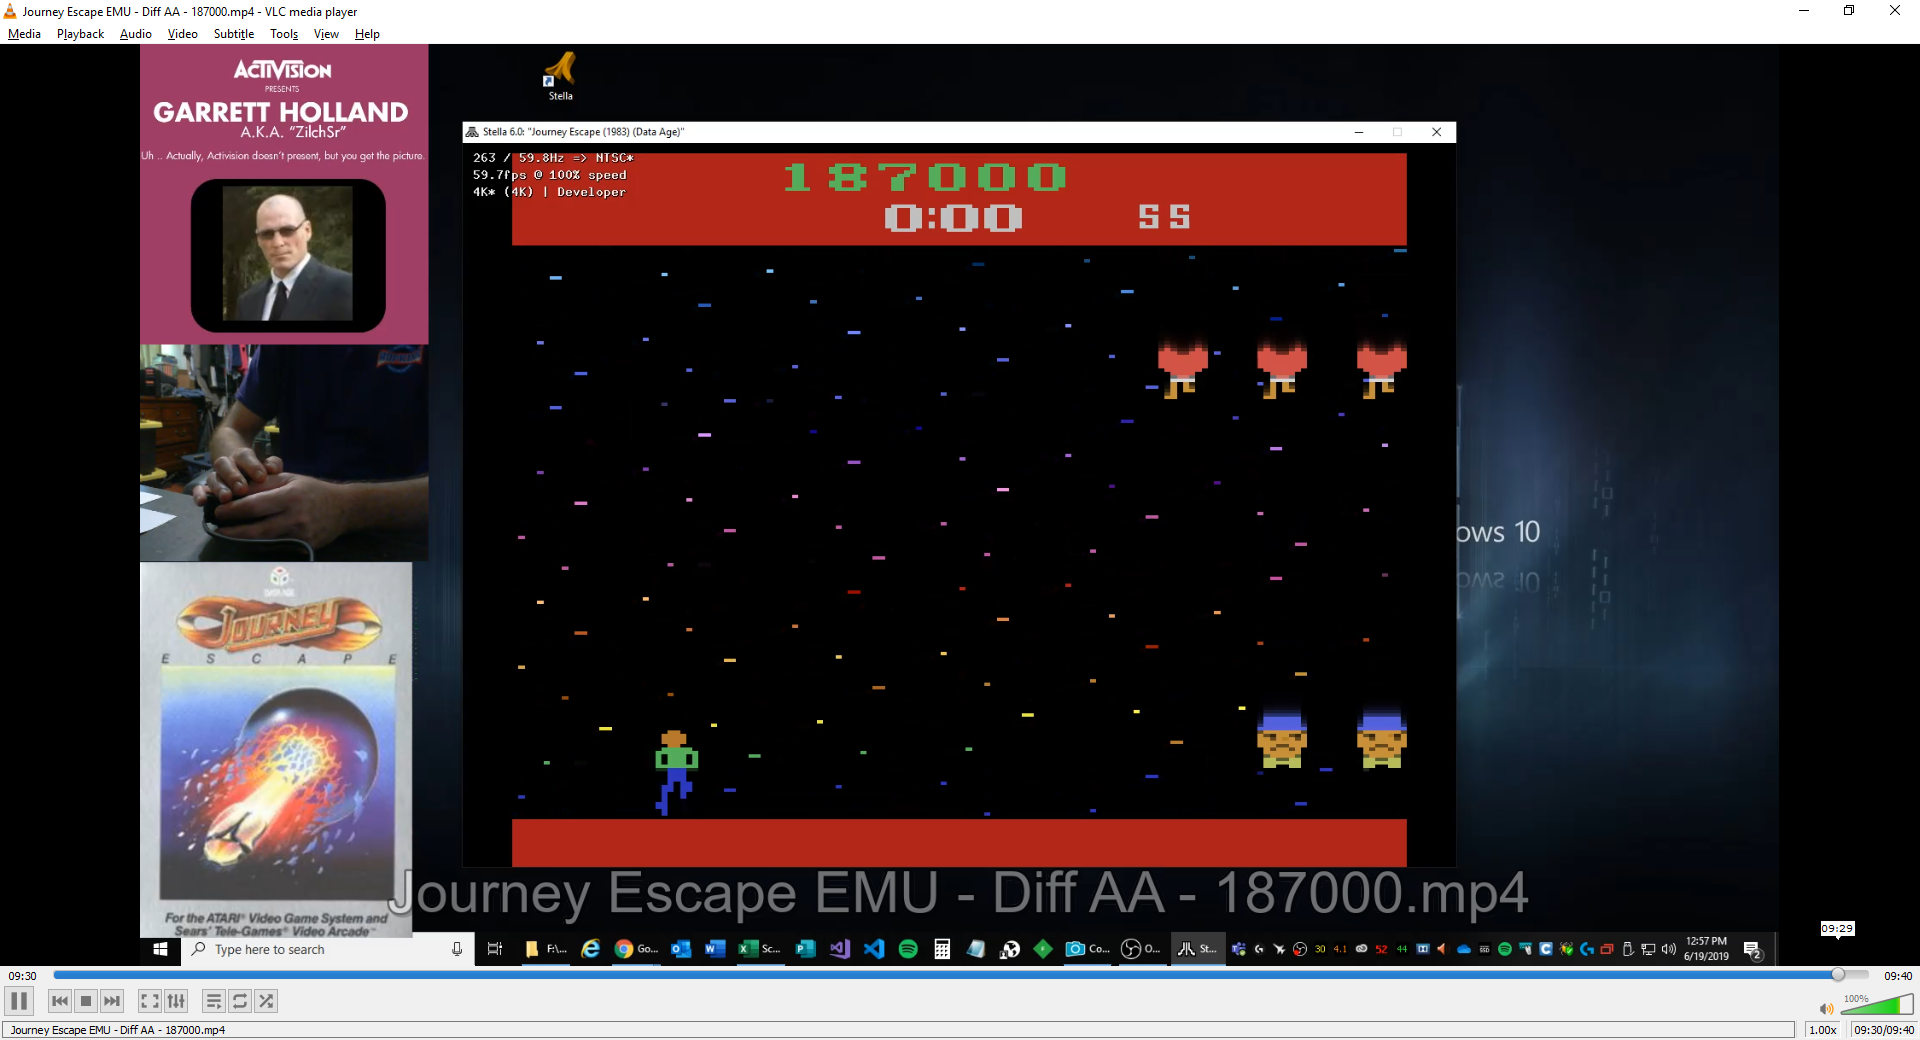 ZilchSr: Journey Escape (Atari 2600 Emulated Expert/A Mode) 187,000 points on 2019-06-19 12:03:17